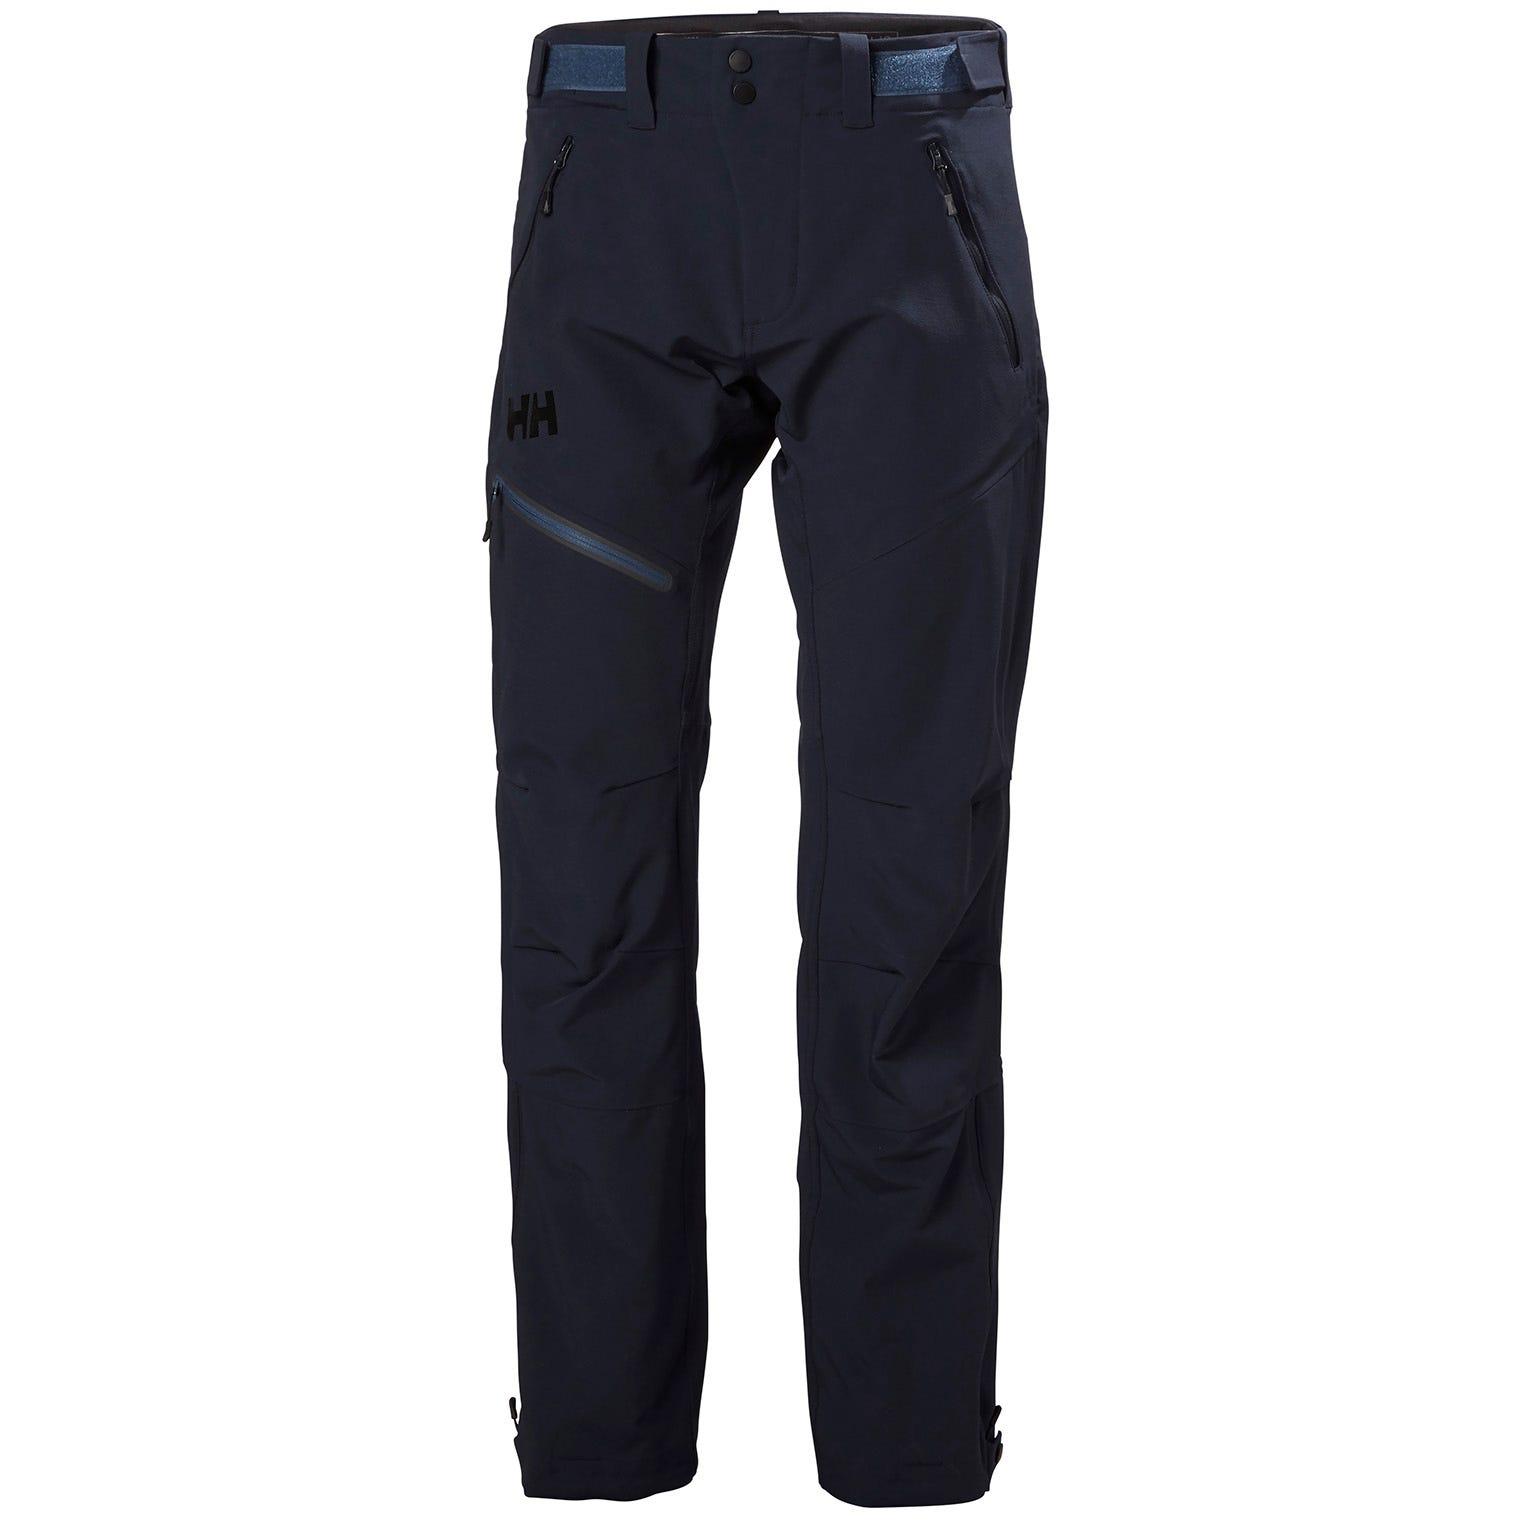 Helly Hansen Mens Odin Huginn Softshell Trousers Navy M